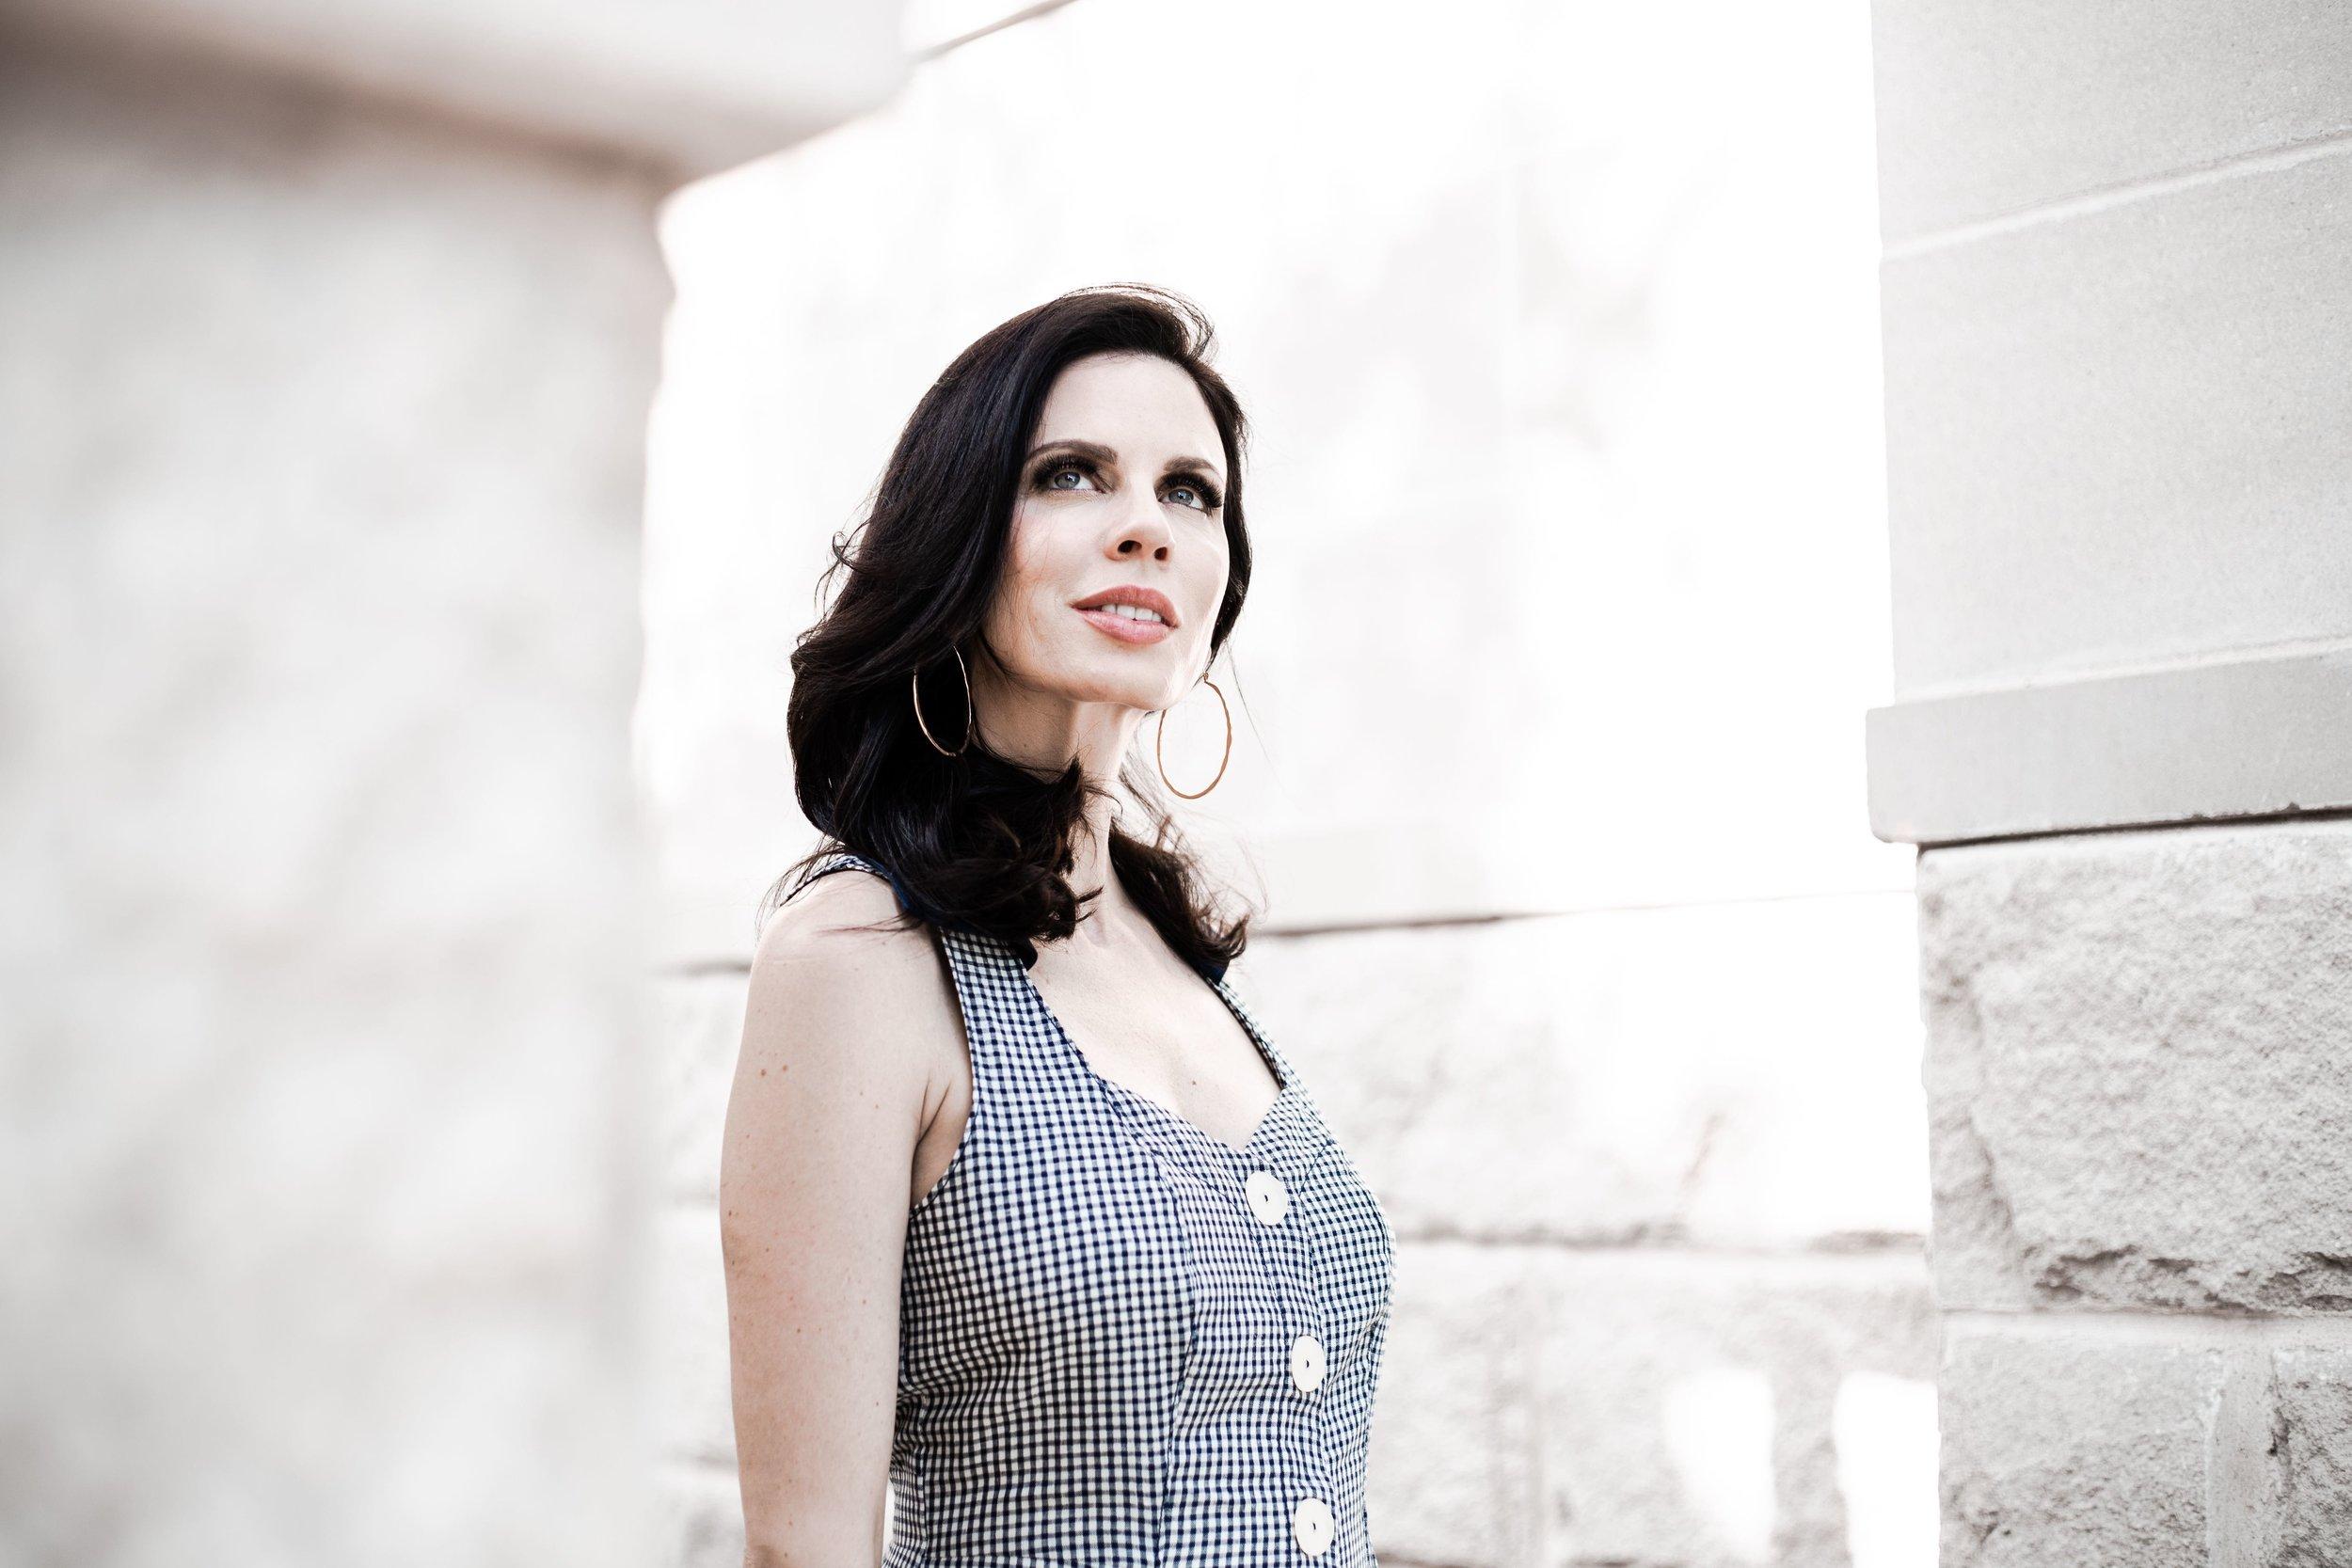 Katie Gustafson - Psychotherapist, writer, and Enneagram teacher based in Nashville, TN.